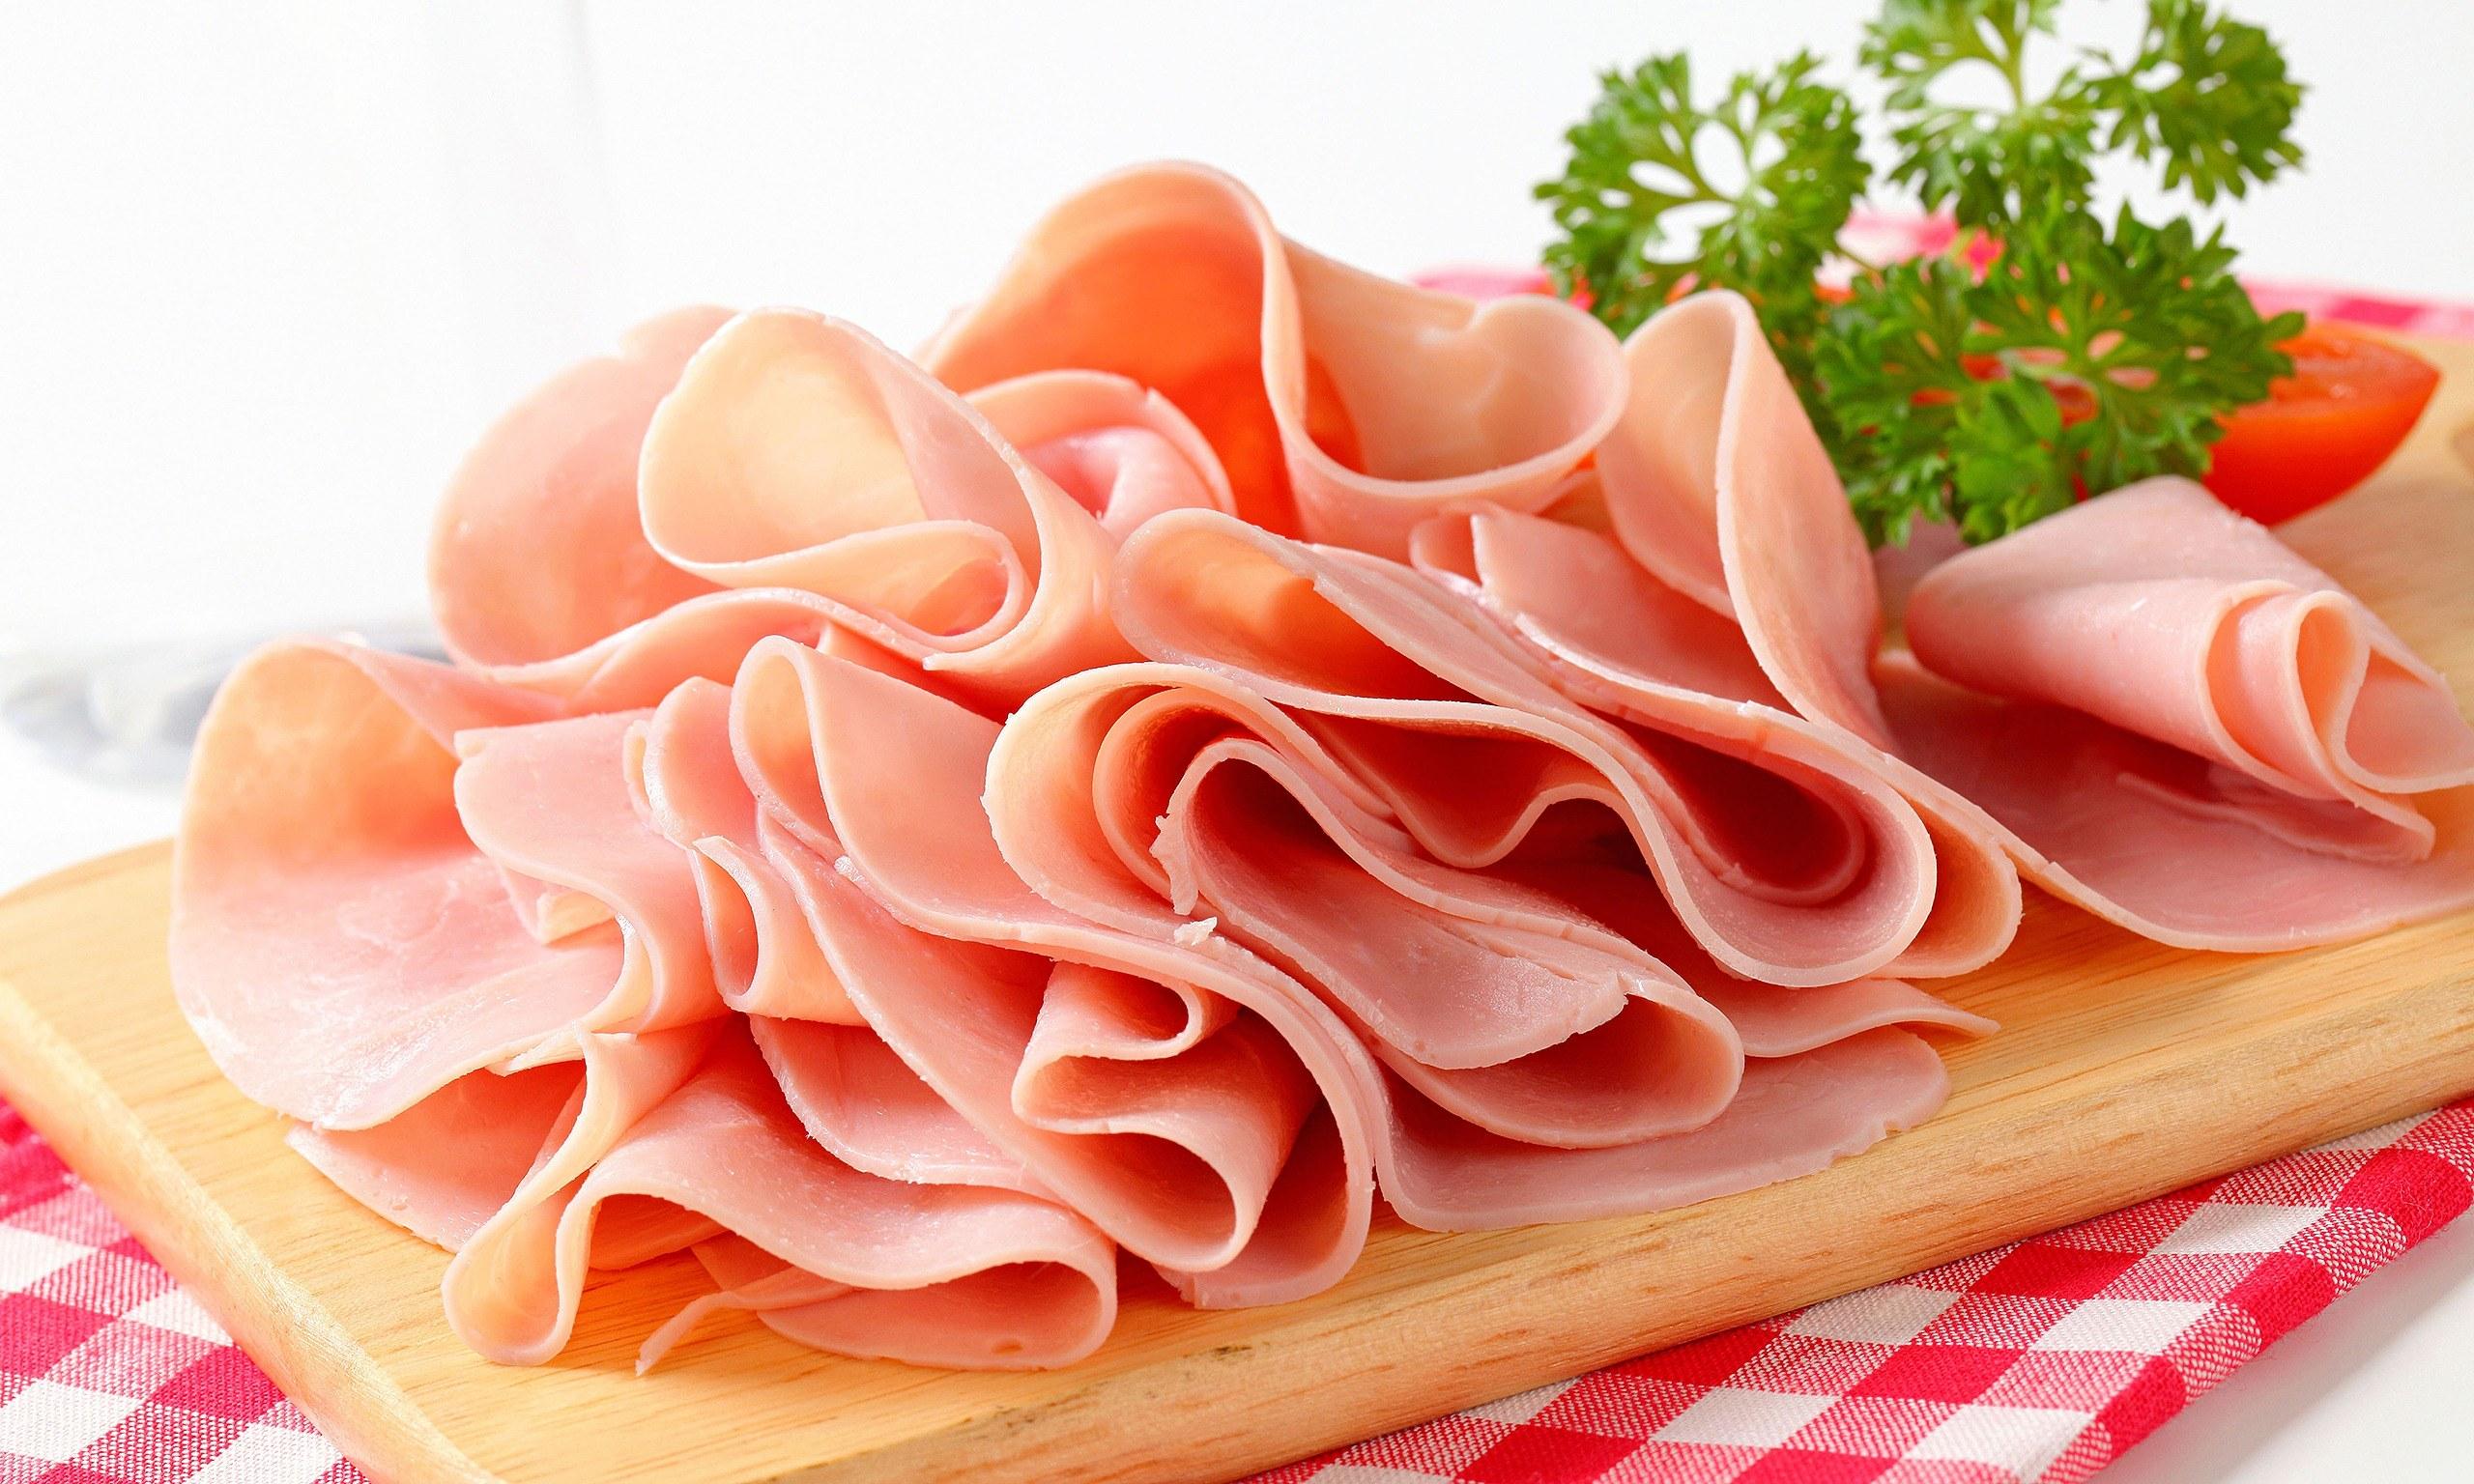 Gluten Free Ham List - The Ultimate Guide